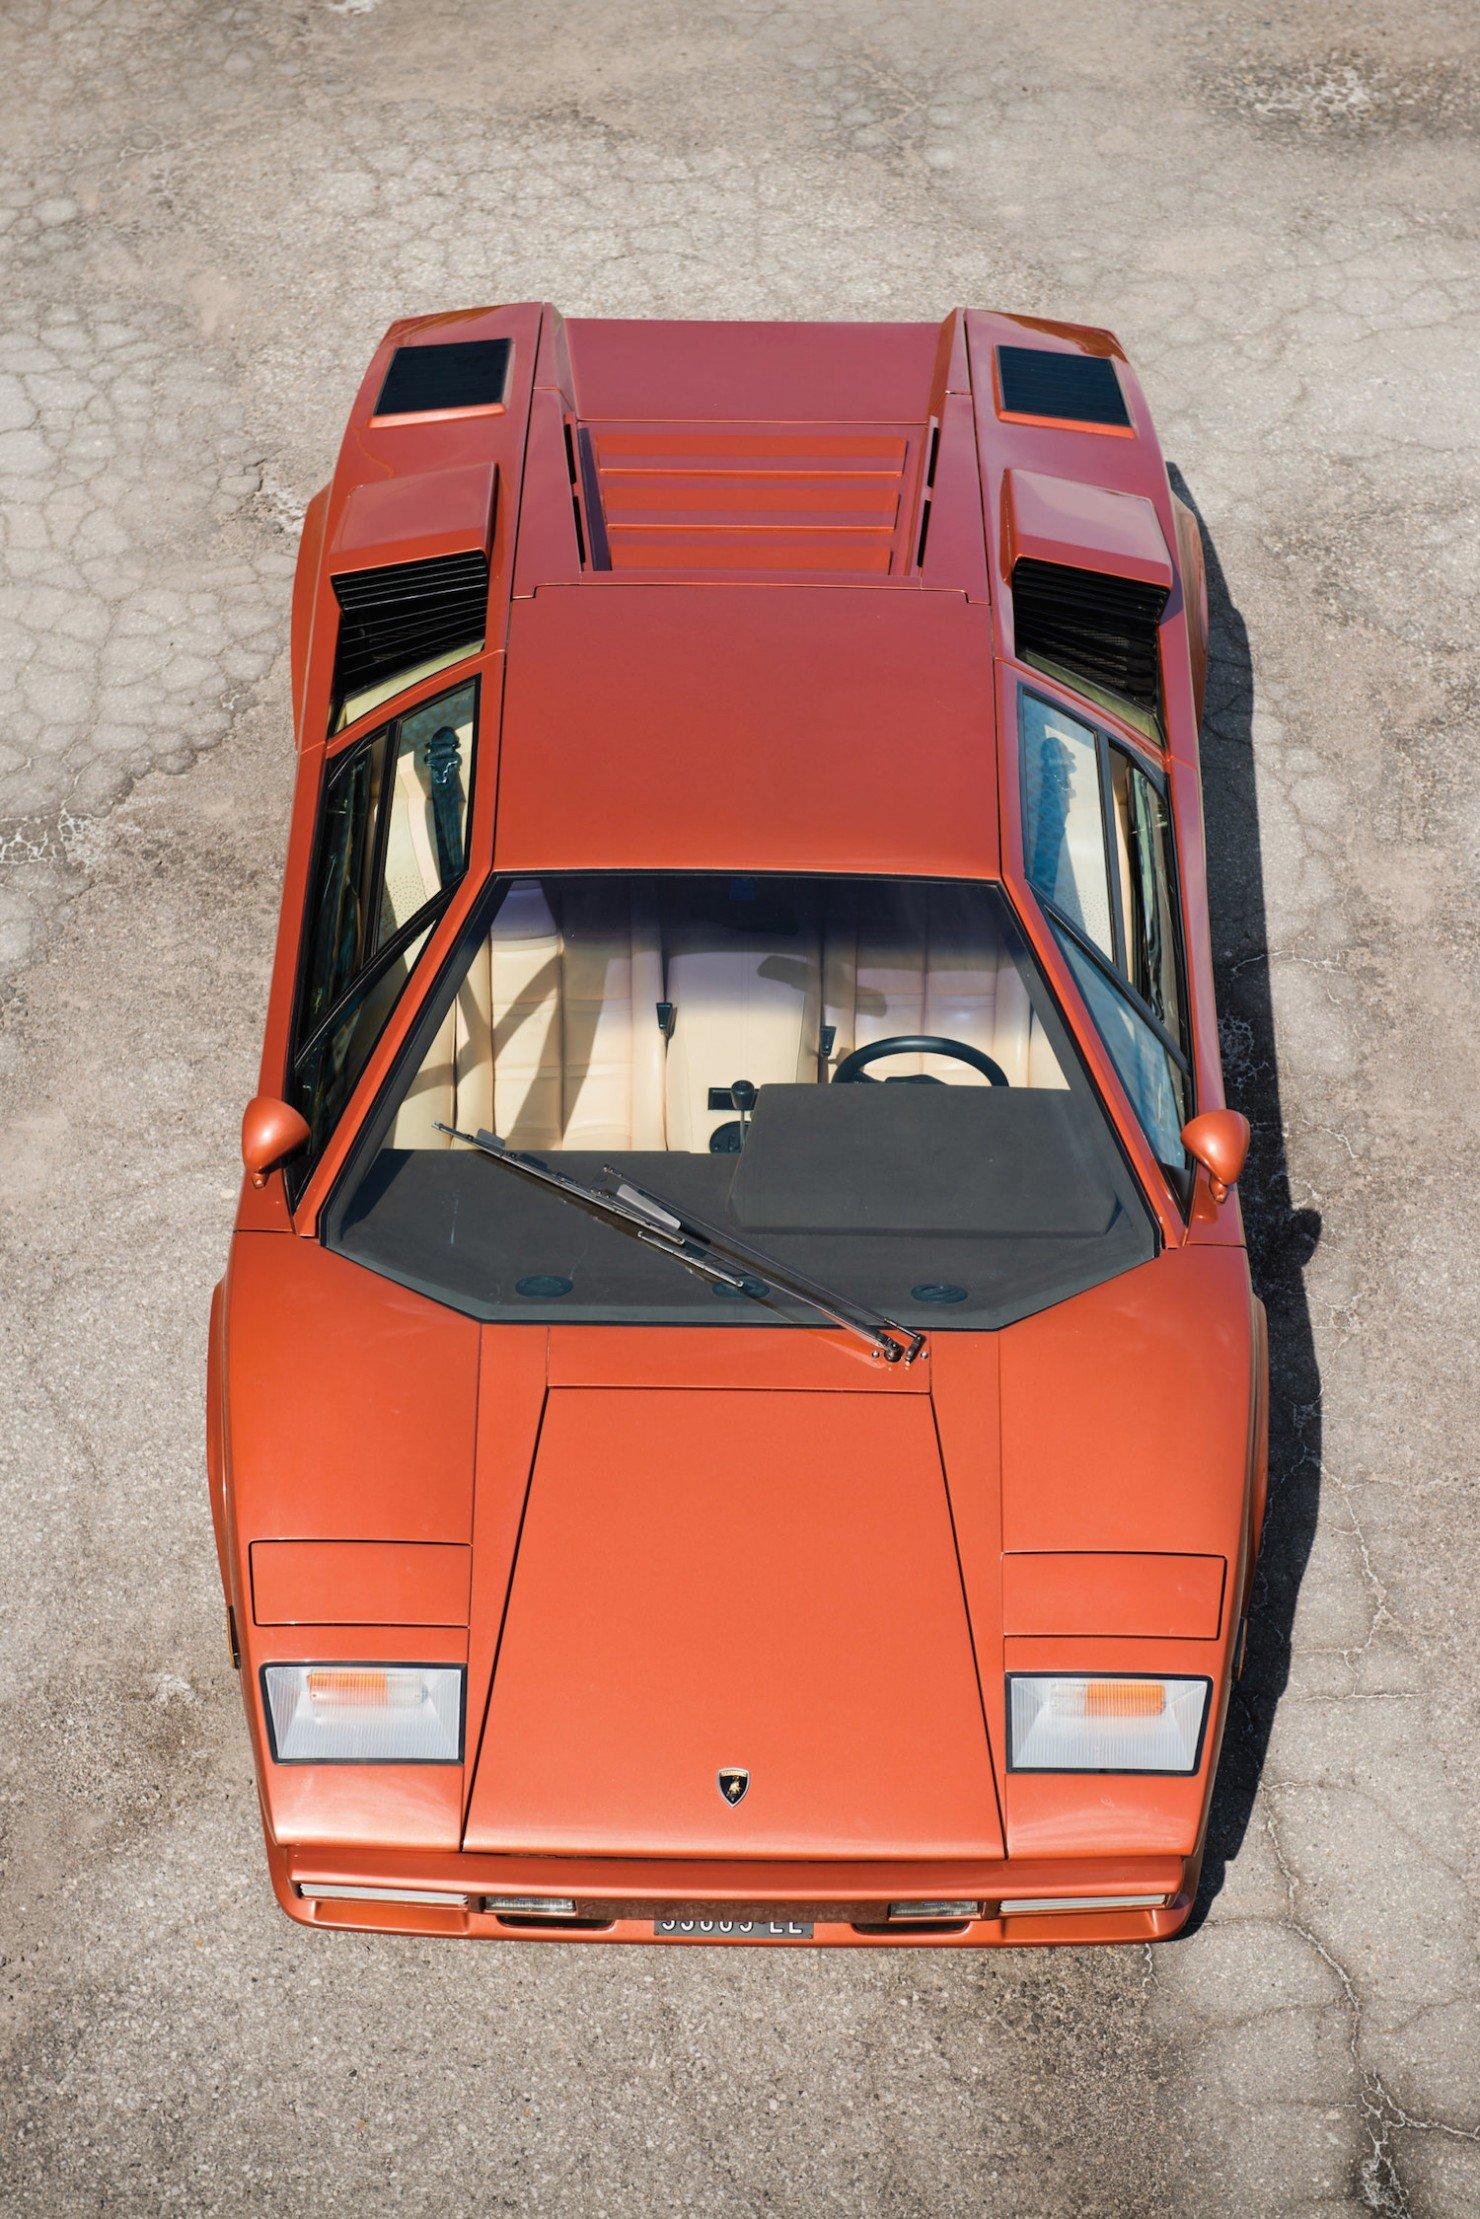 Lamborghini_Countach_LP400S_12